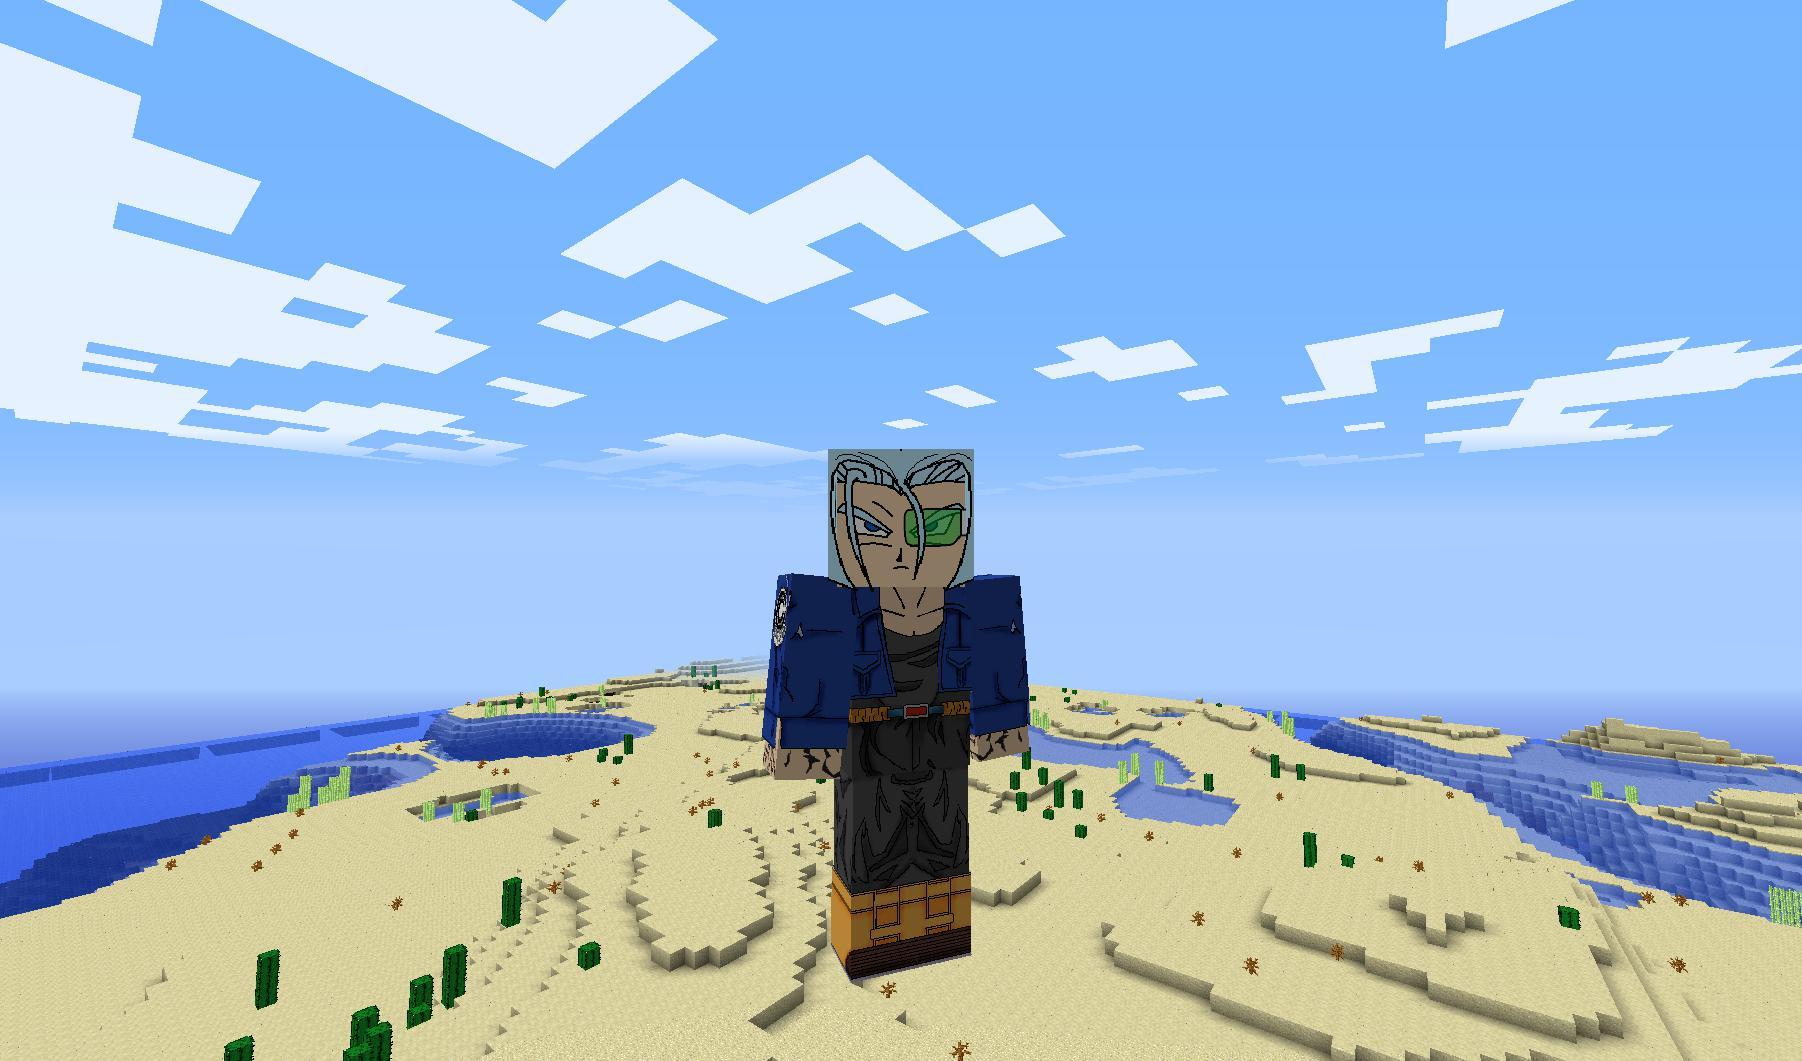 Мод Comes Alive для Minecraft 1.7.10/1.7.2/1.6.4/1.5.2